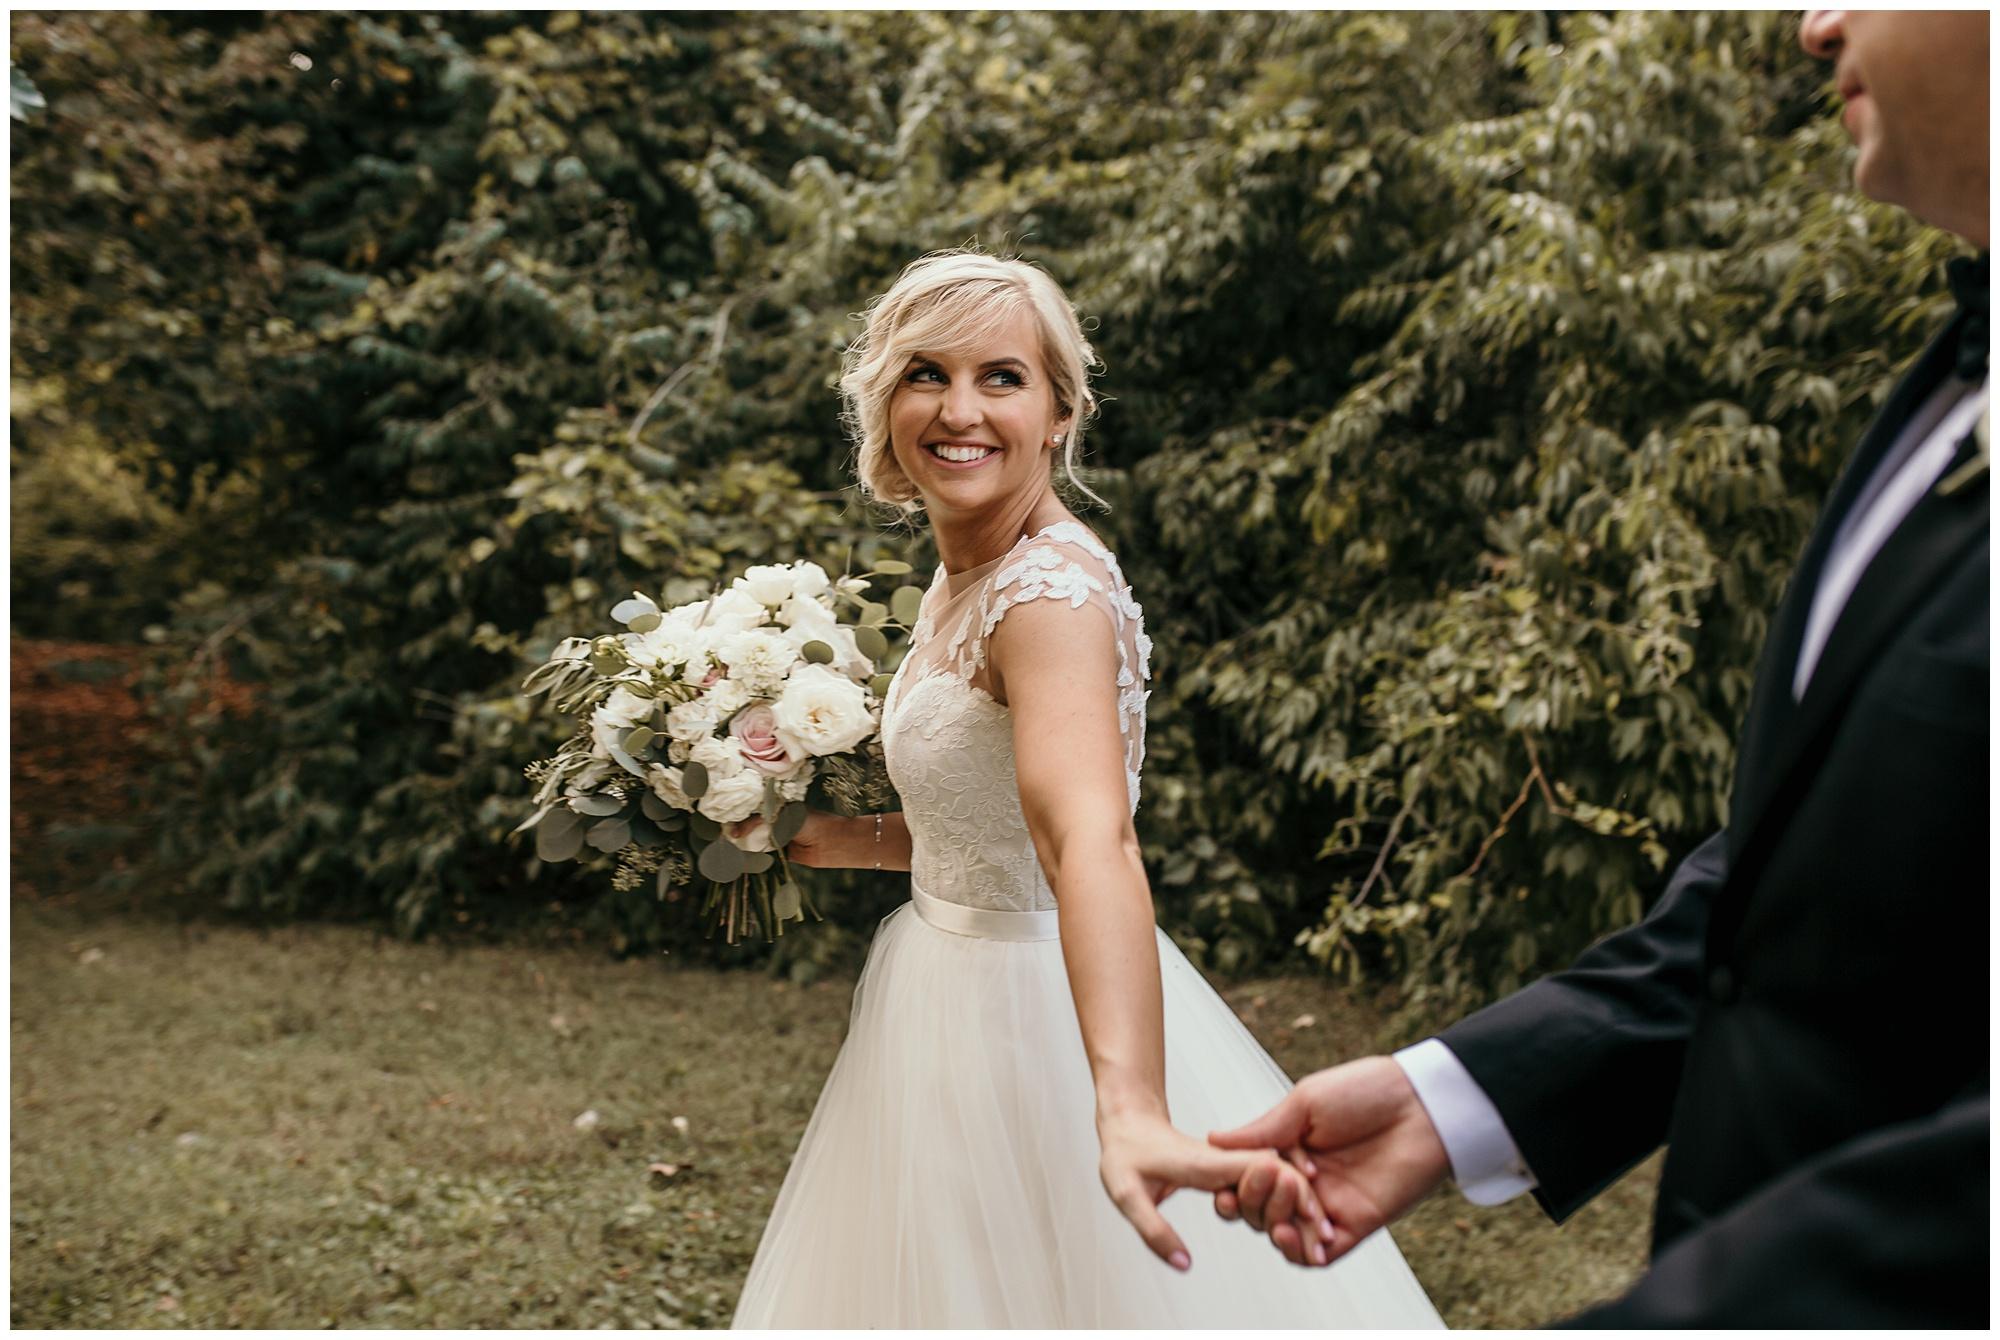 pear_tree_estate_wedding_champaign_il_wright_photographs_jj_0088.jpg